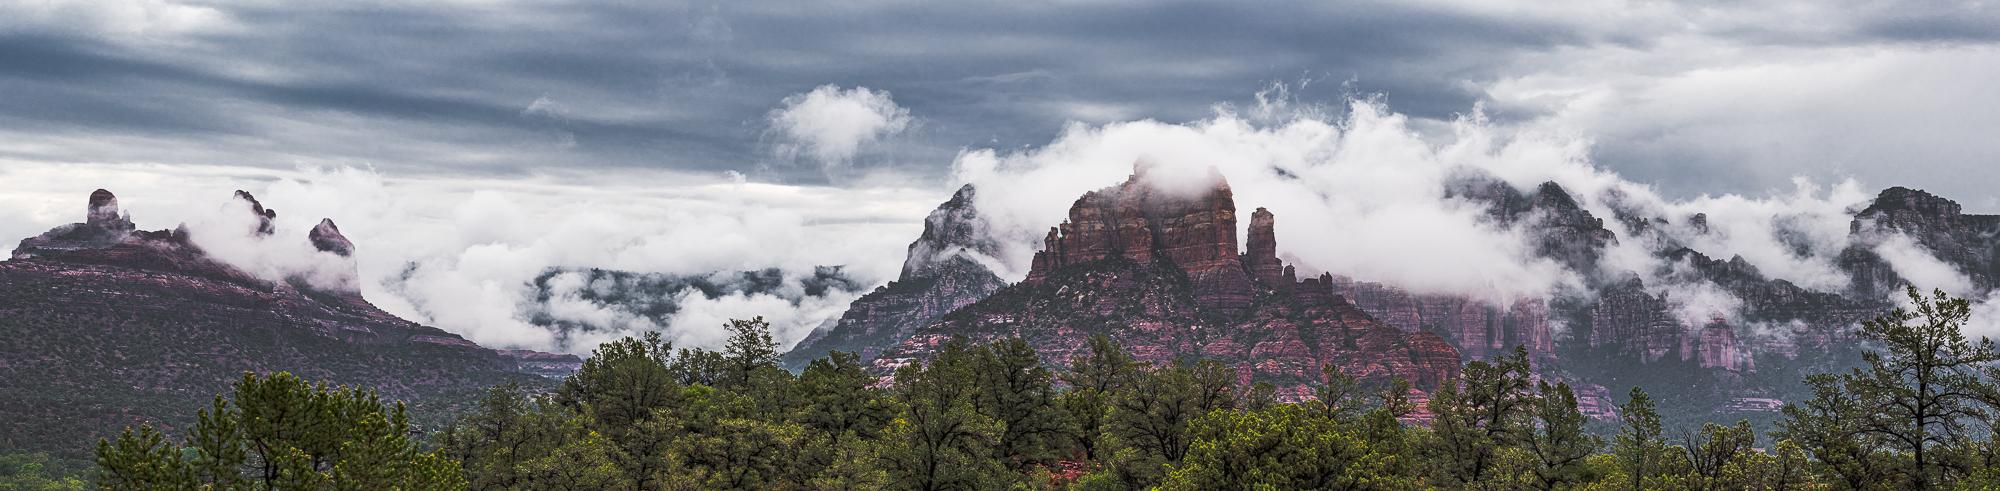 """Monsoon Clouds Over the Mogollon Rim"", 4th edit"